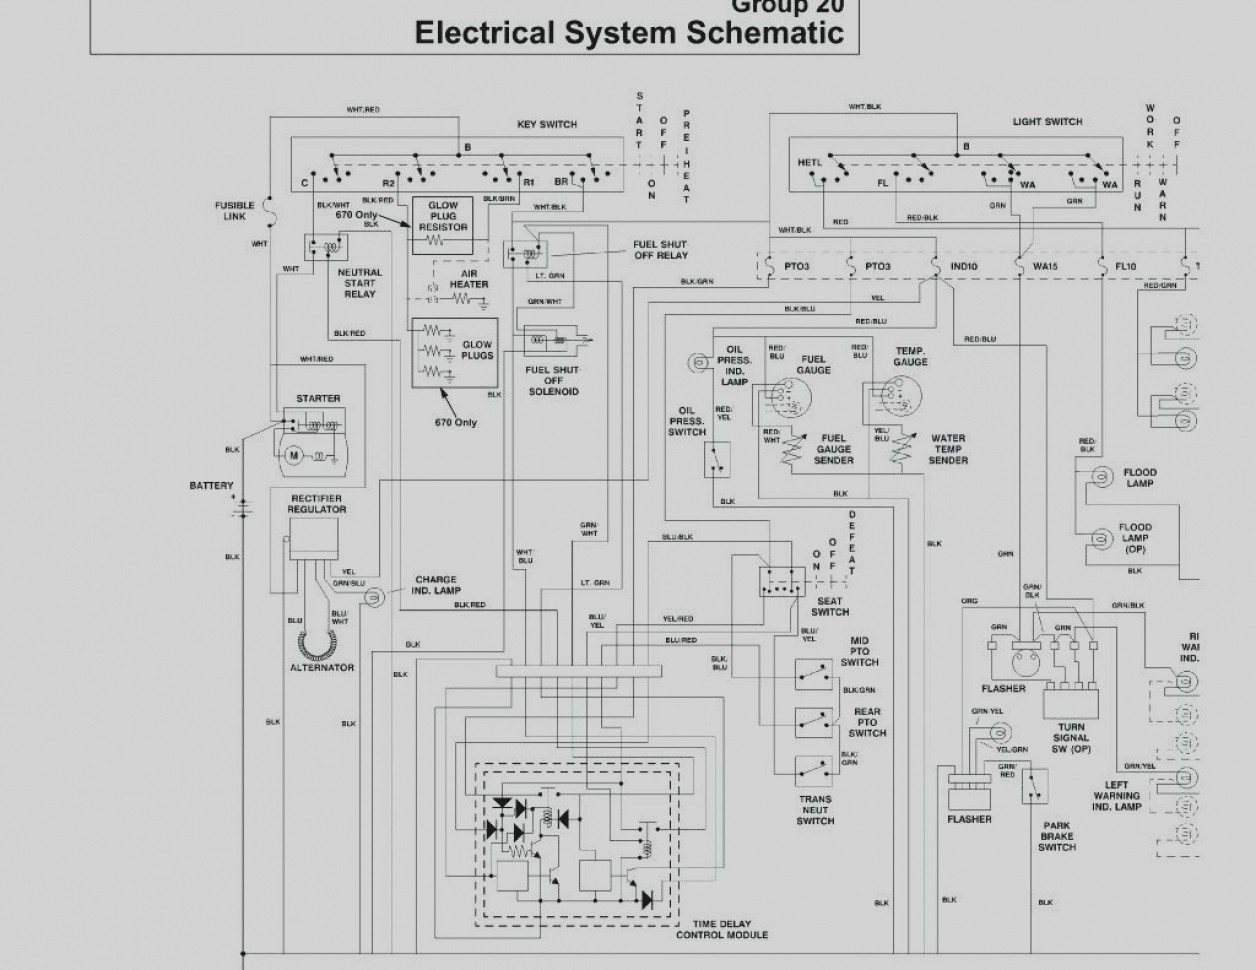 ed_2399] 9230 case ih wiring schematic  cran mimig embo xeira vira mohammedshrine librar wiring 101